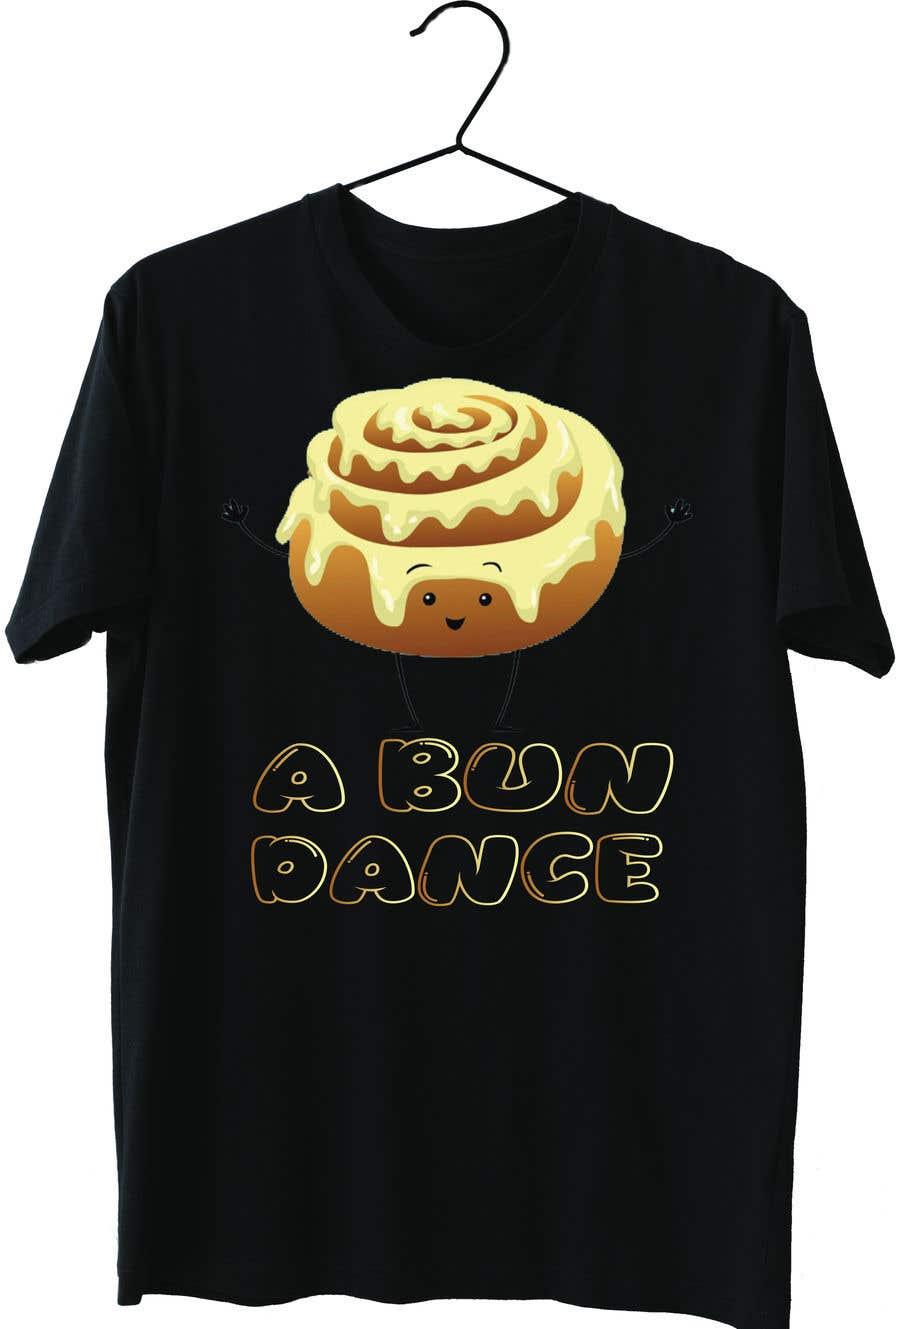 Bài tham dự cuộc thi #                                        12                                      cho                                         A Bun Dance Graphic Design T-Shirt